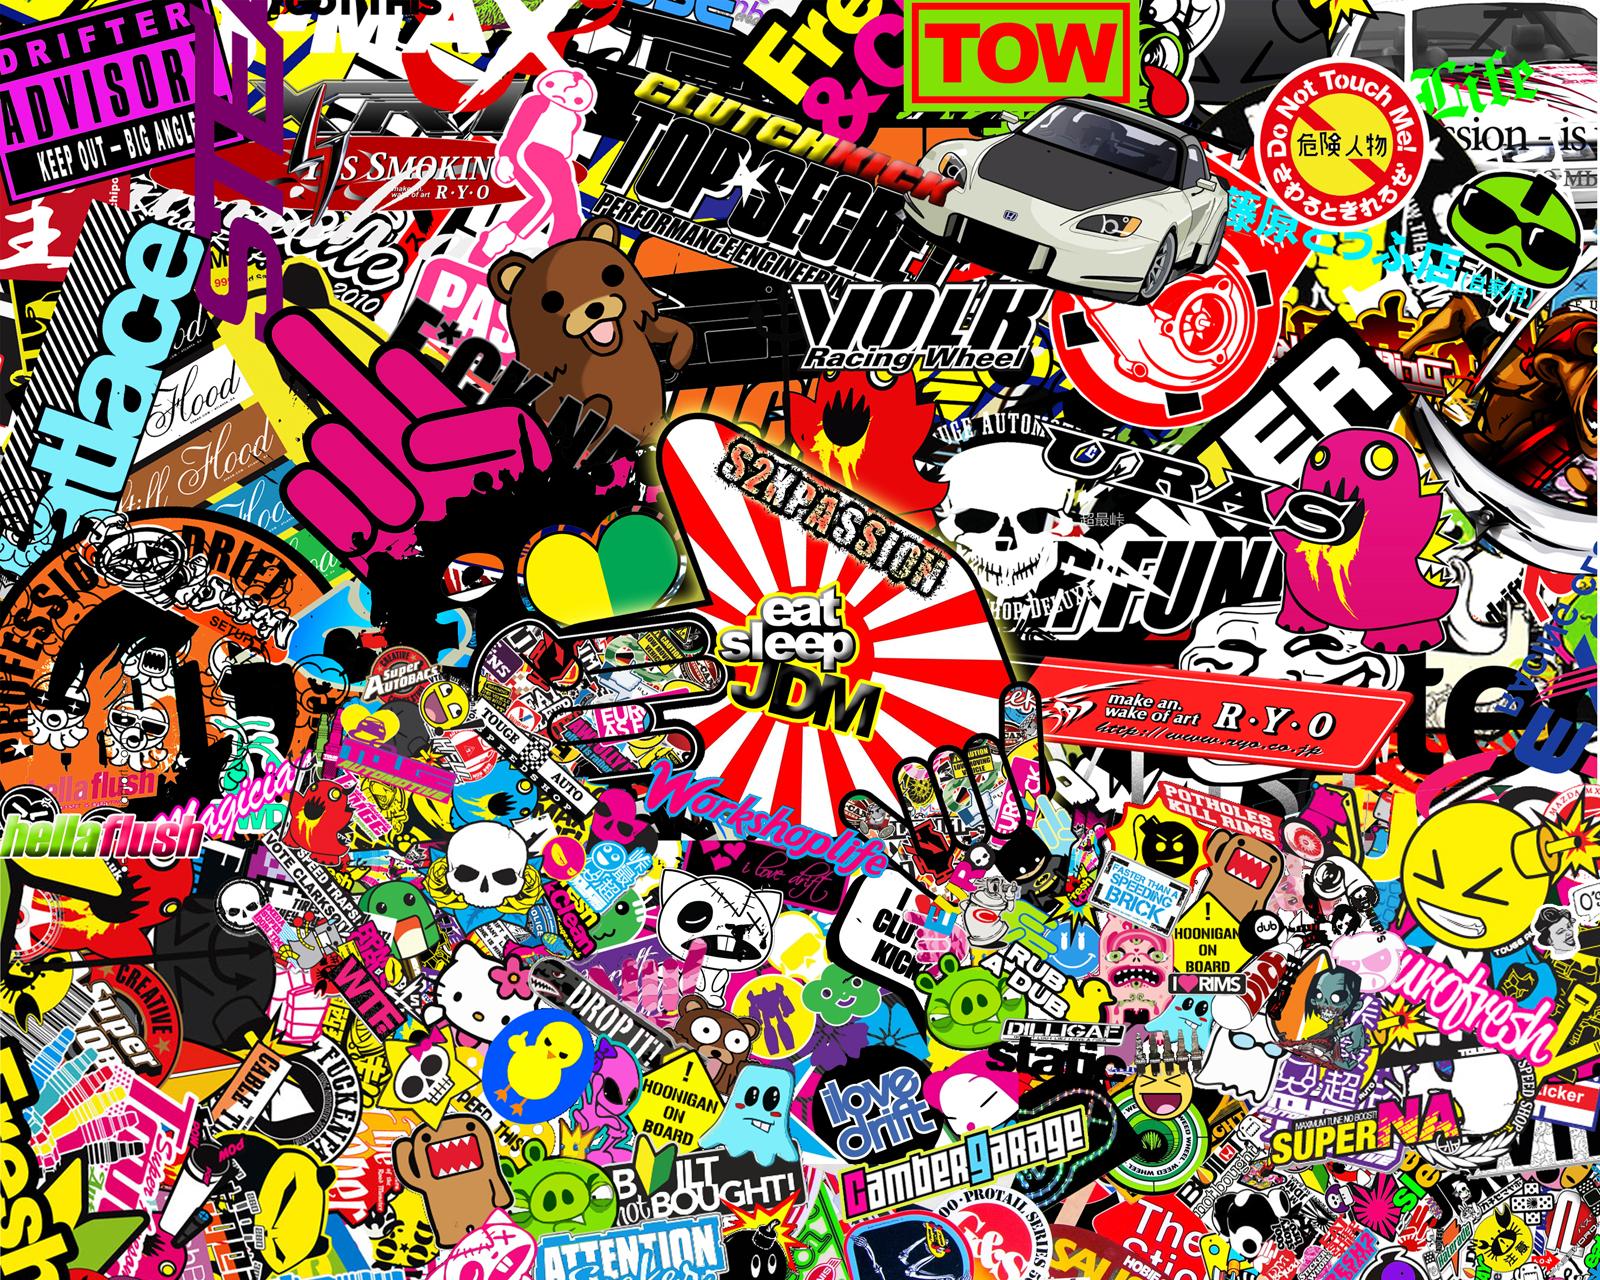 Sticker bomb wallpaper best cool wallpaper hd download